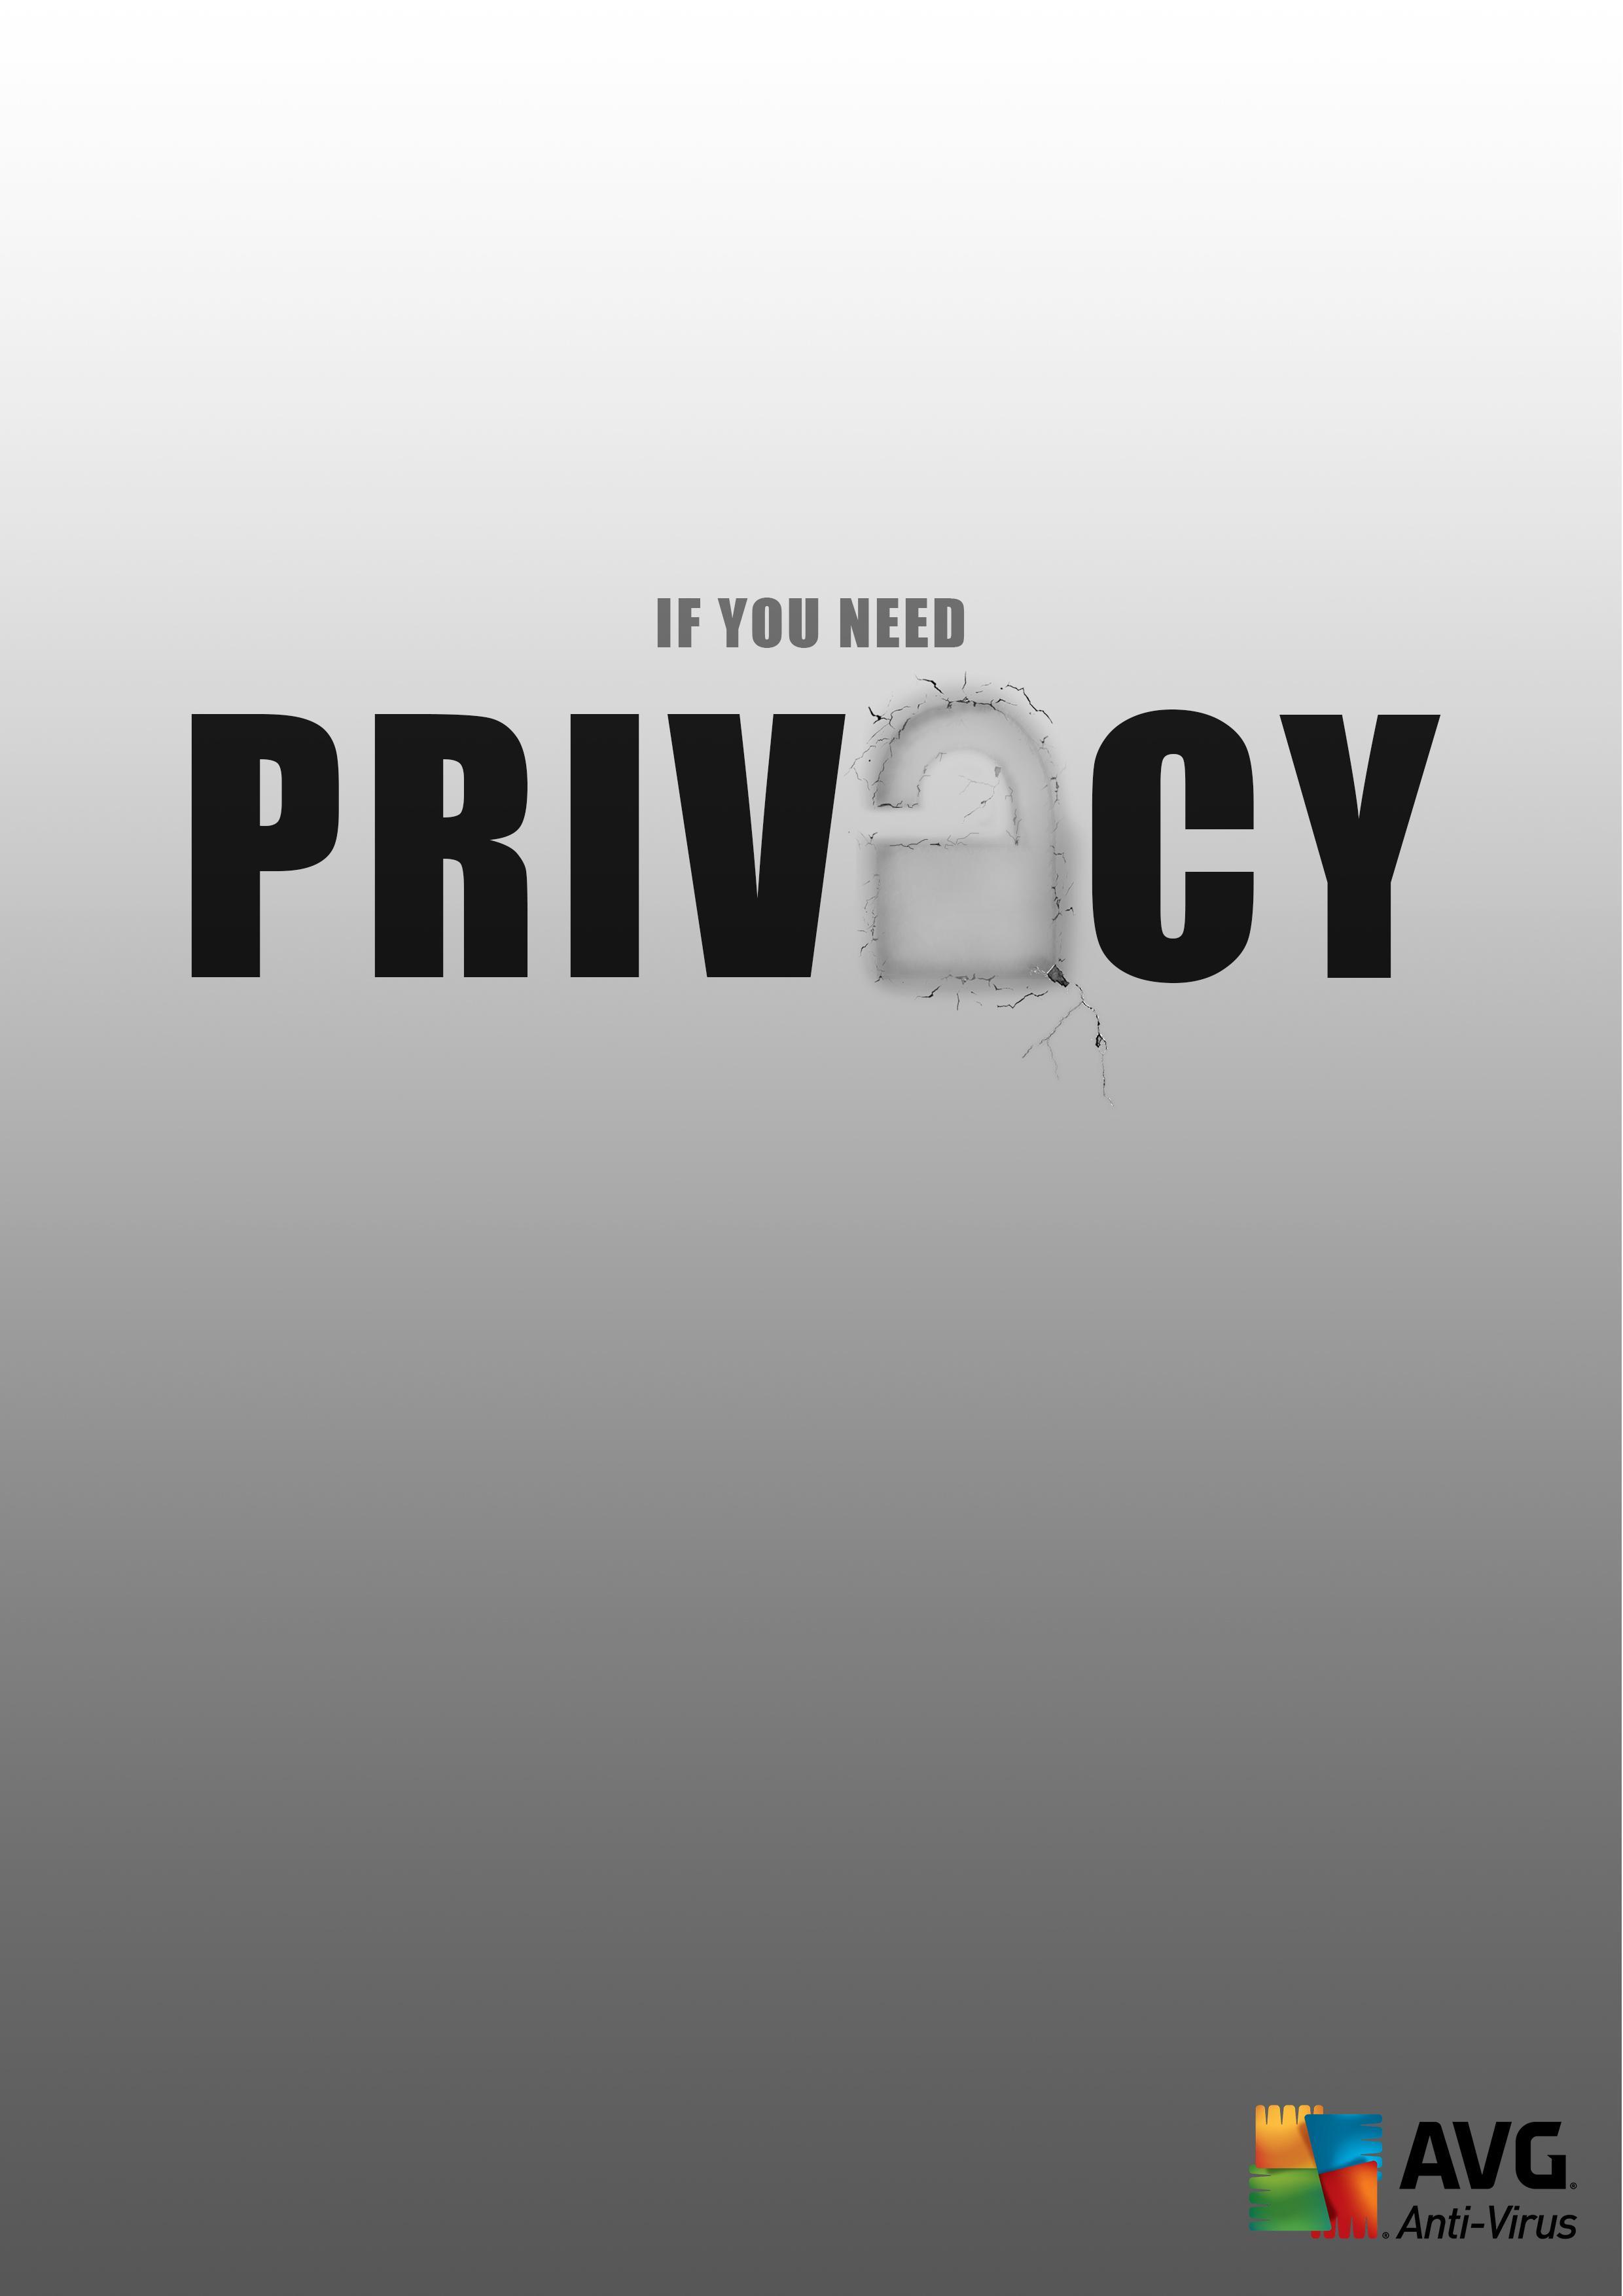 AVG Print Ad - Privacy